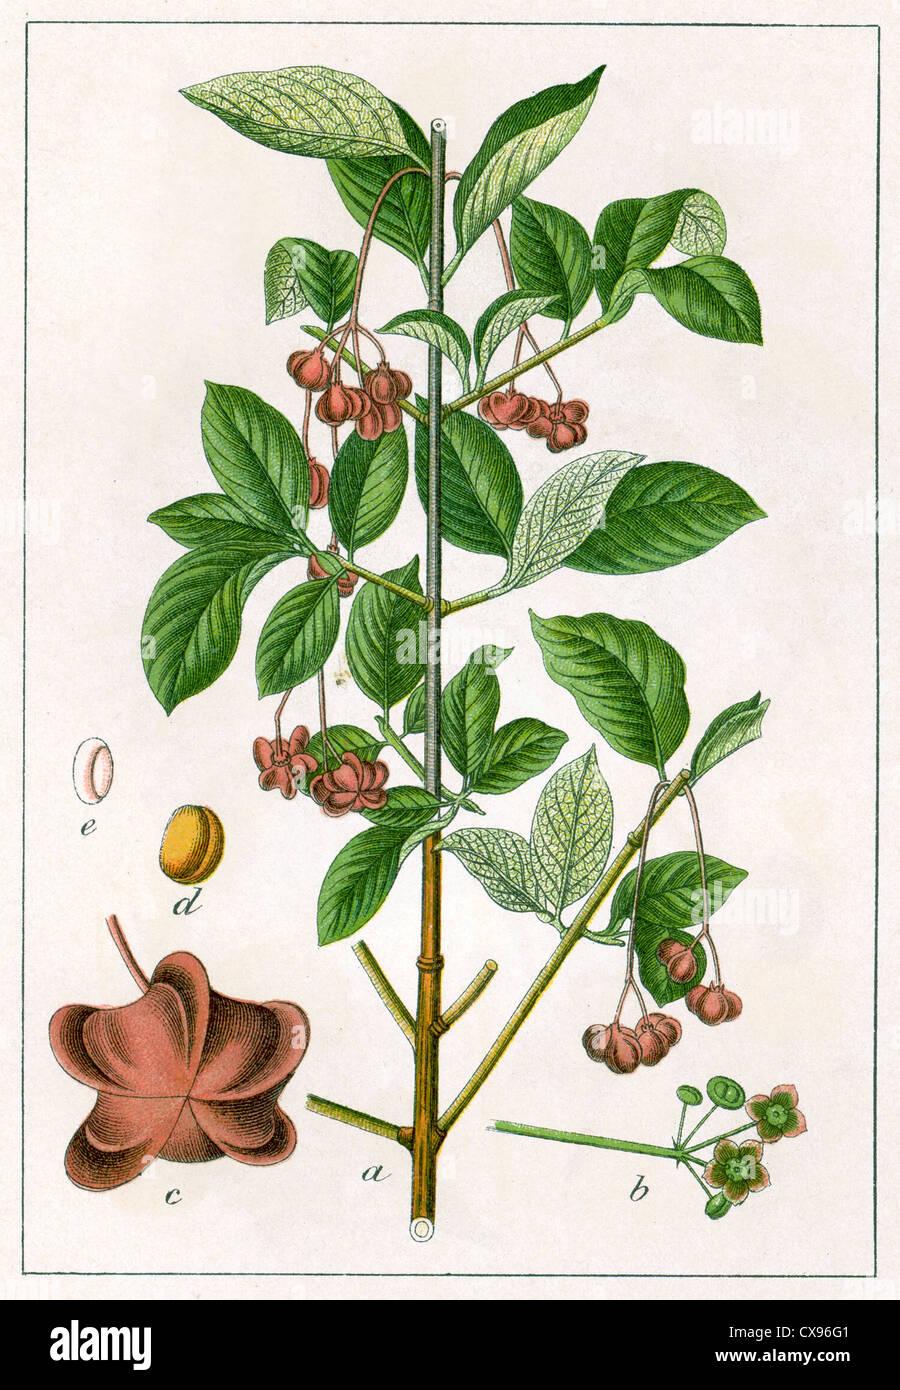 Evonymus latifolia - Stock Image